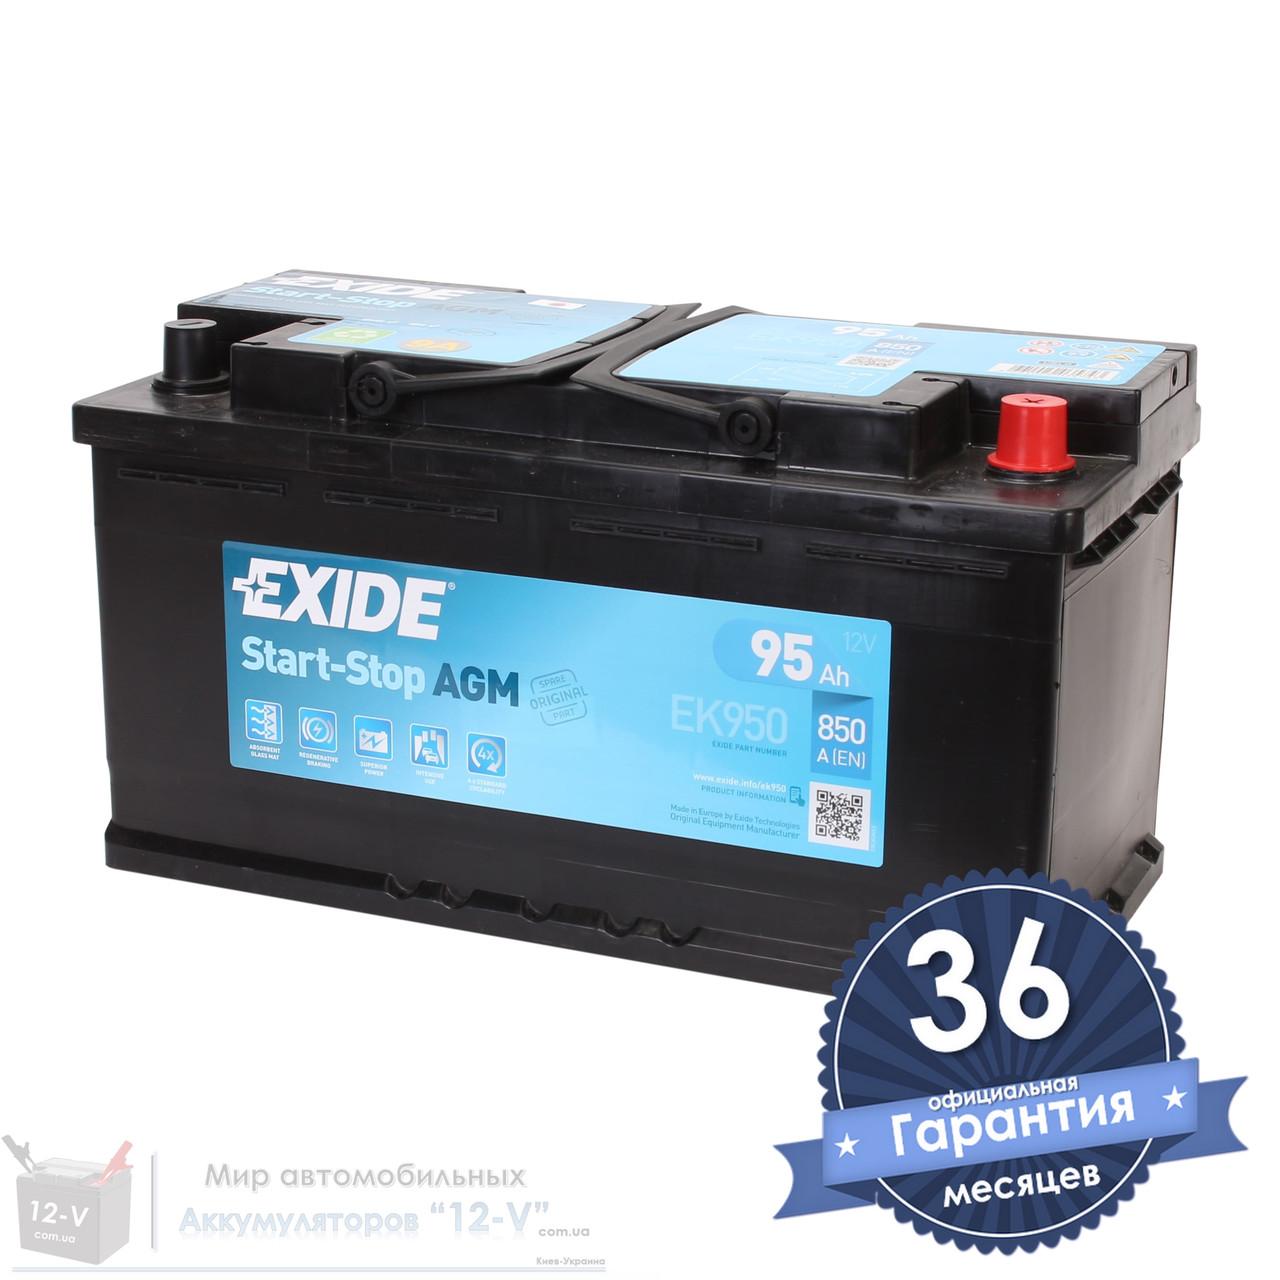 Аккумулятор автомобильный EXIDE AGM 6CT 95Ah, пусковой ток 850А [–|+] (EK950)